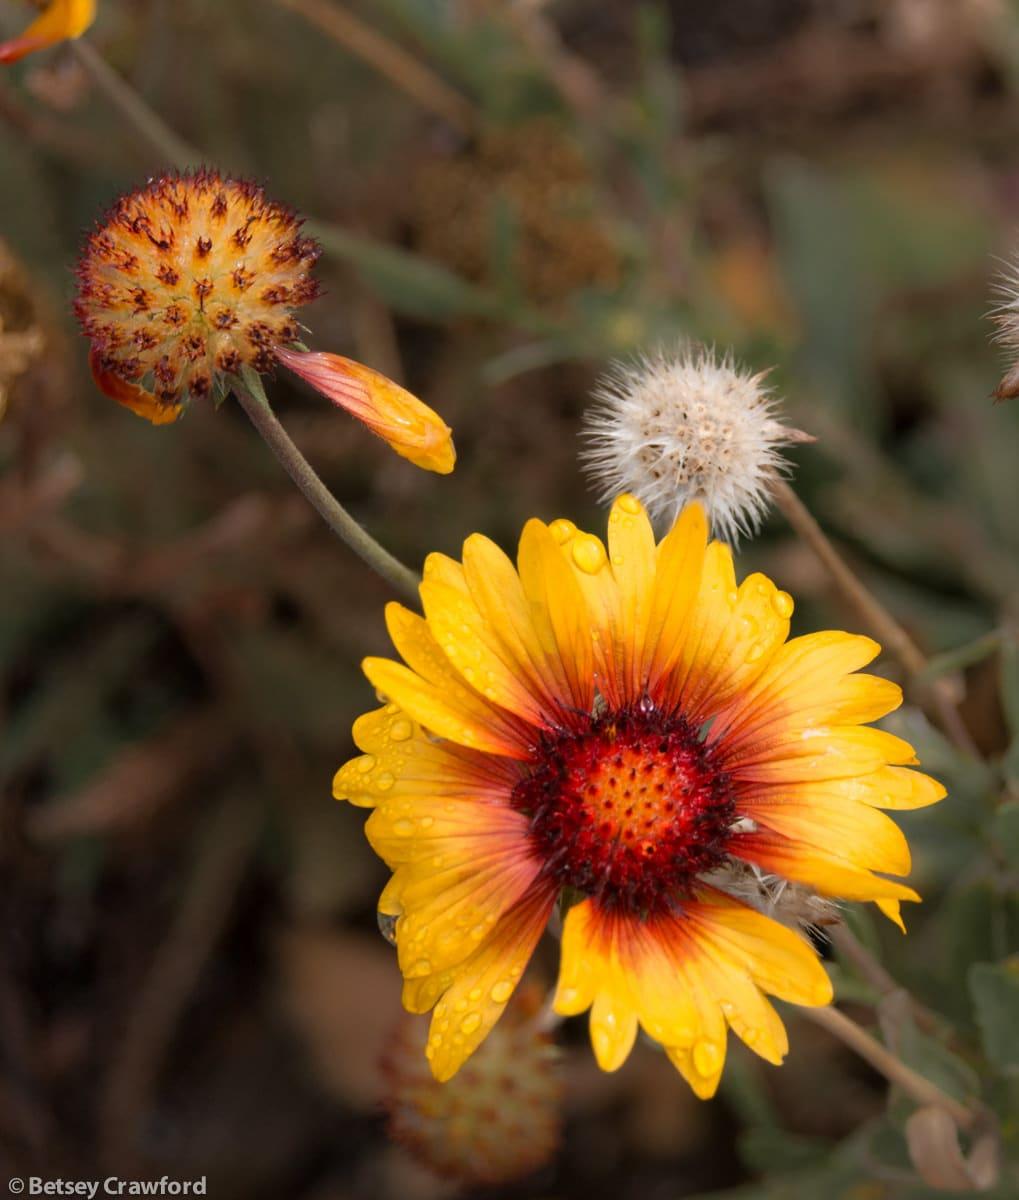 Blanket flower (Gaillardia aristata) Coeur d'Alene, Idaho